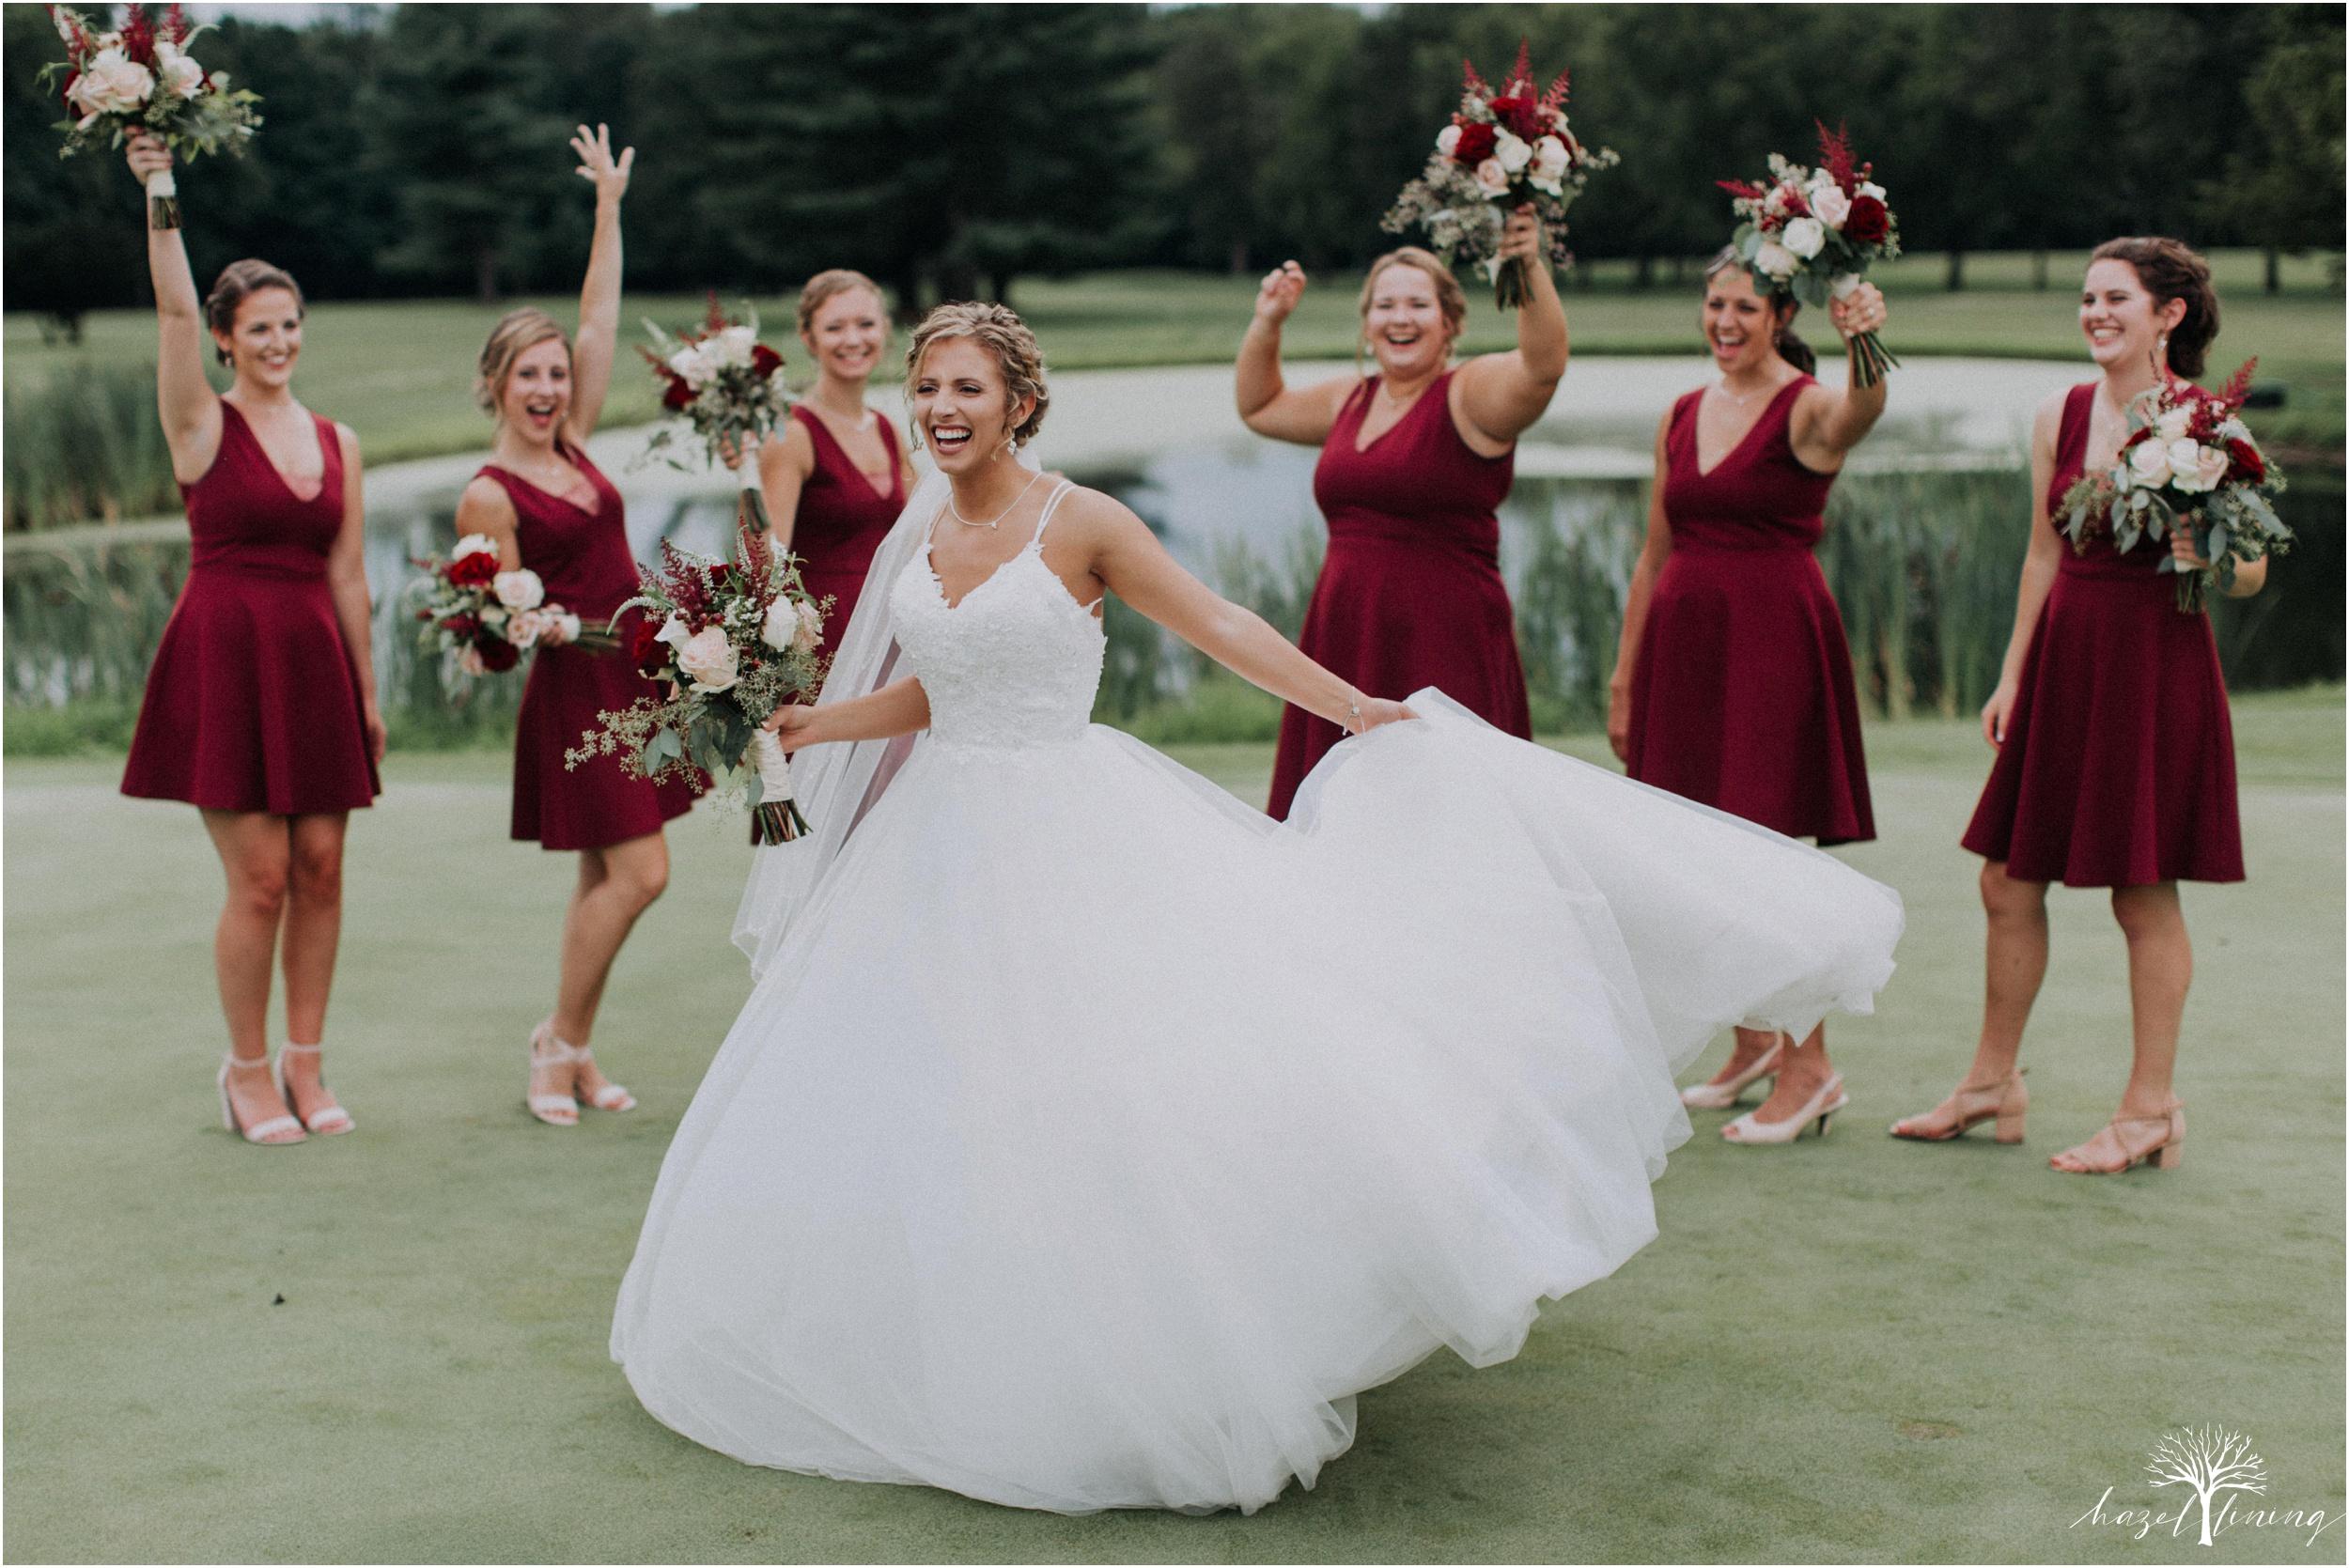 jonathan-weibel-becky-haywood-loft-at-sweetwater-cc-pennsburg-pennsylvania-rainy-day-summer-wedding-hazel-lining-travel-wedding-elopement-photography_0070.jpg